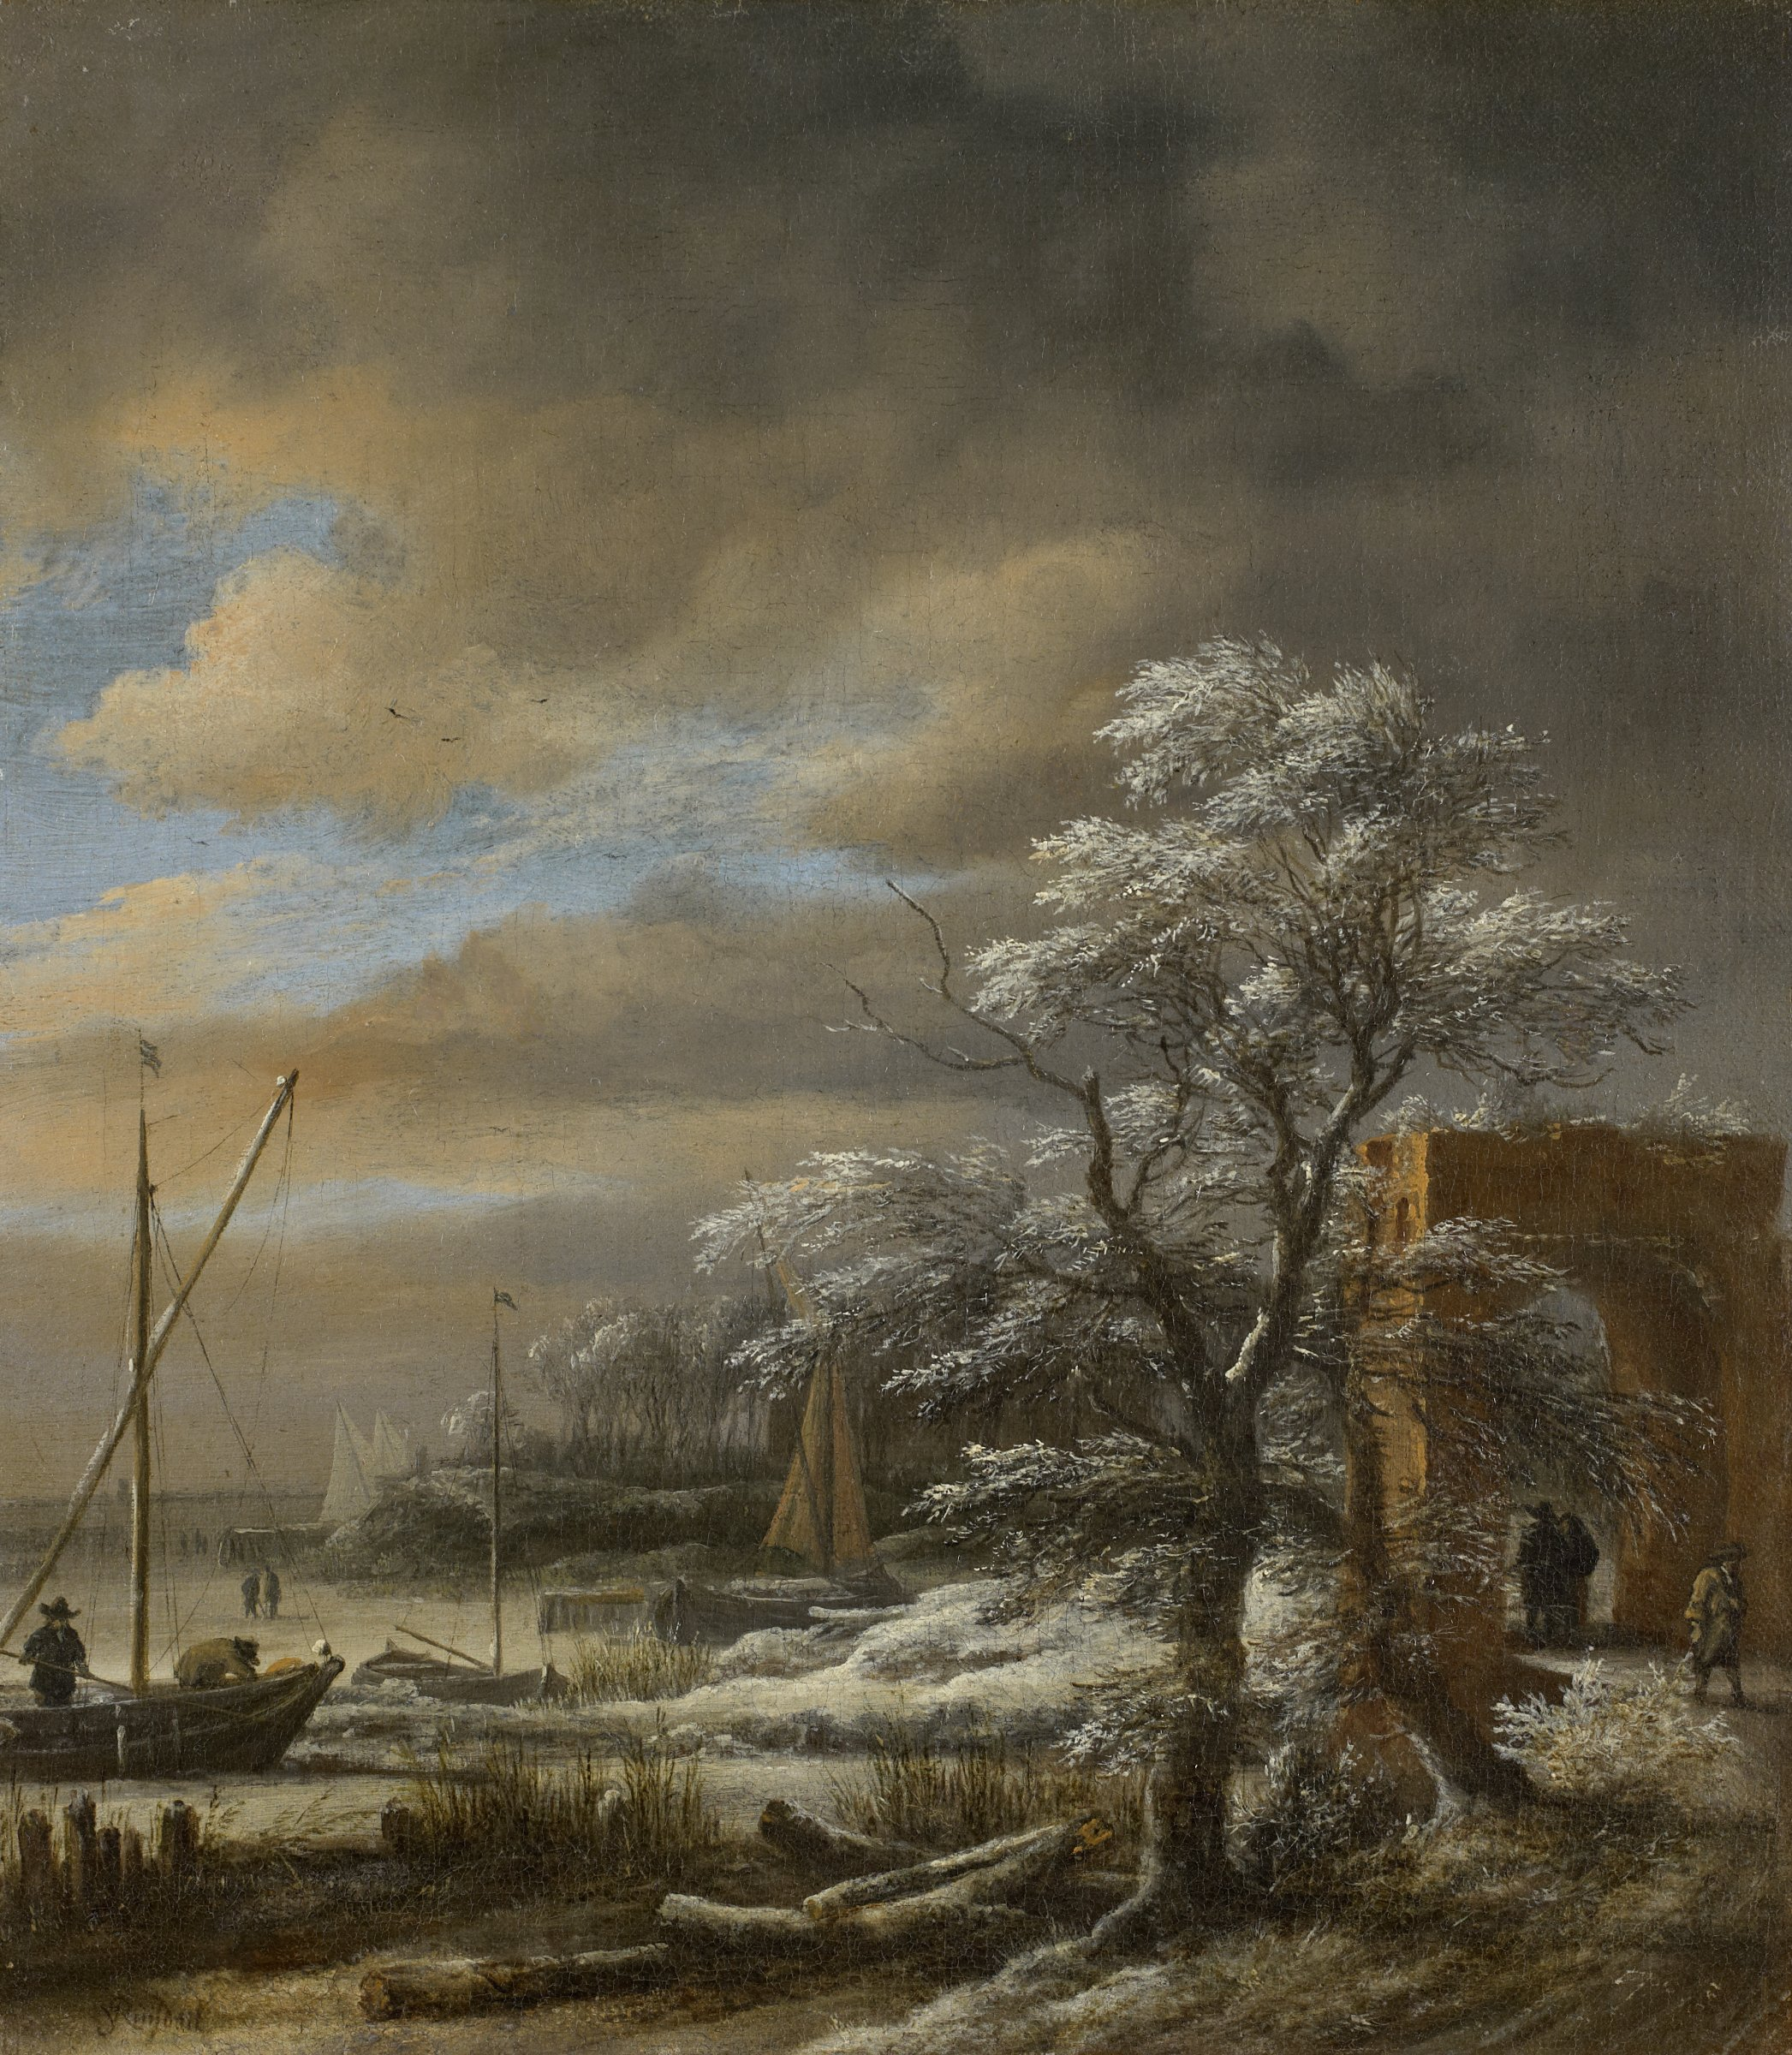 Winter Landscape, Jacob van Ruisdael, oil on canvas